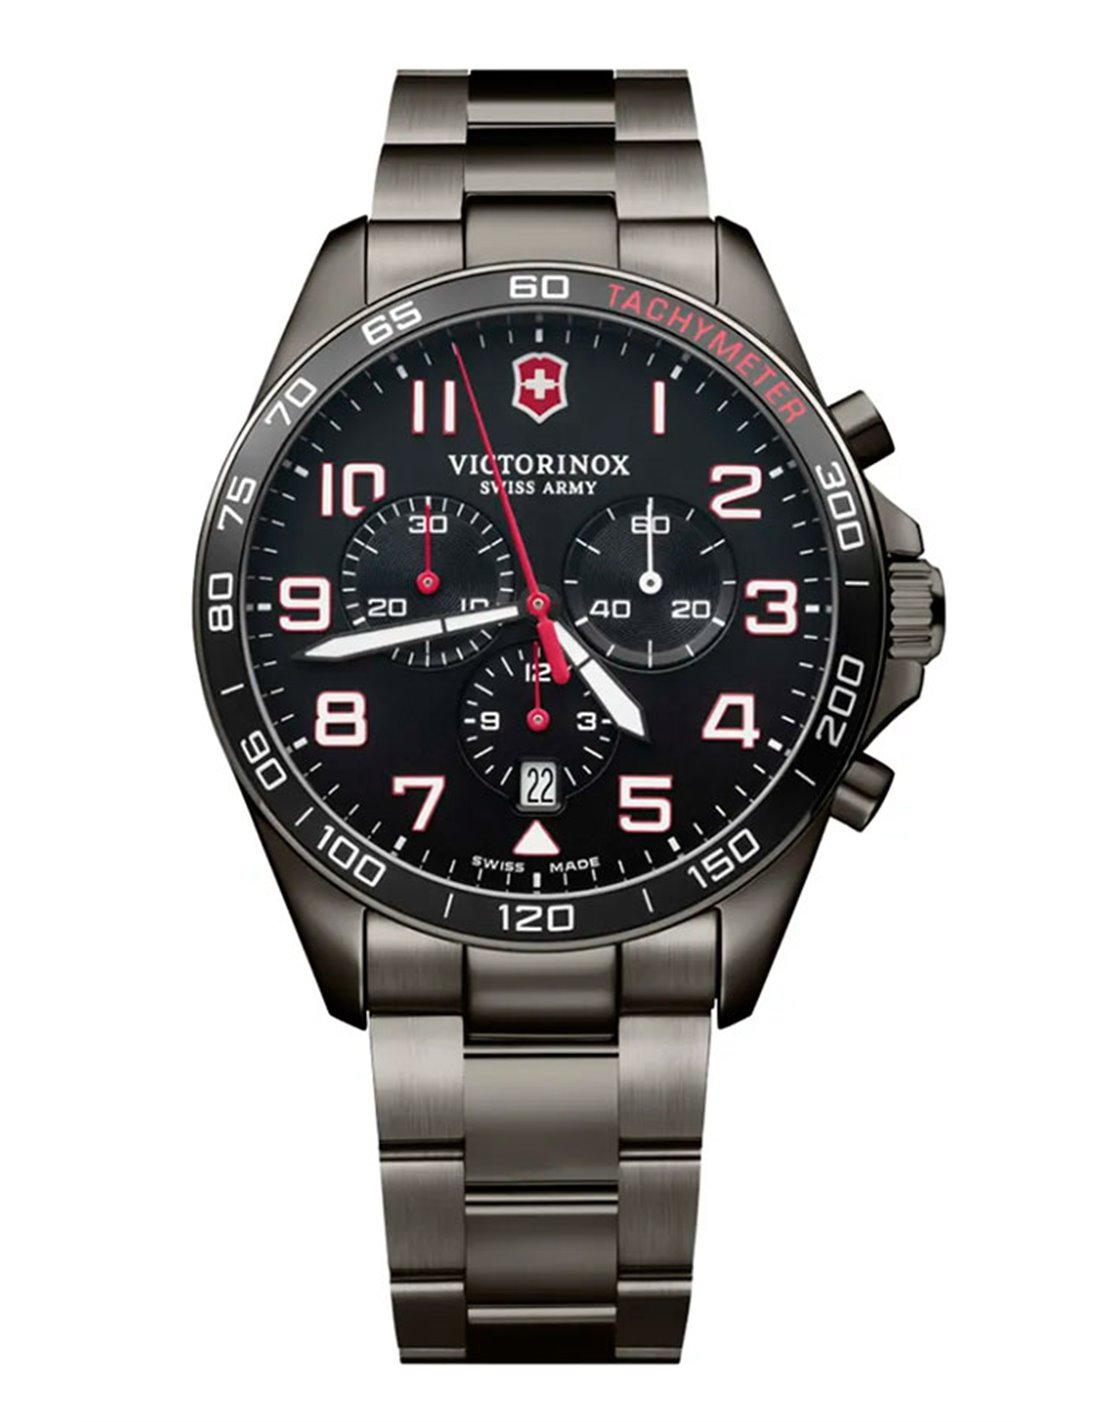 V241890 | Victorinox Watch SWISS ARMY FIELDFORCE V241890